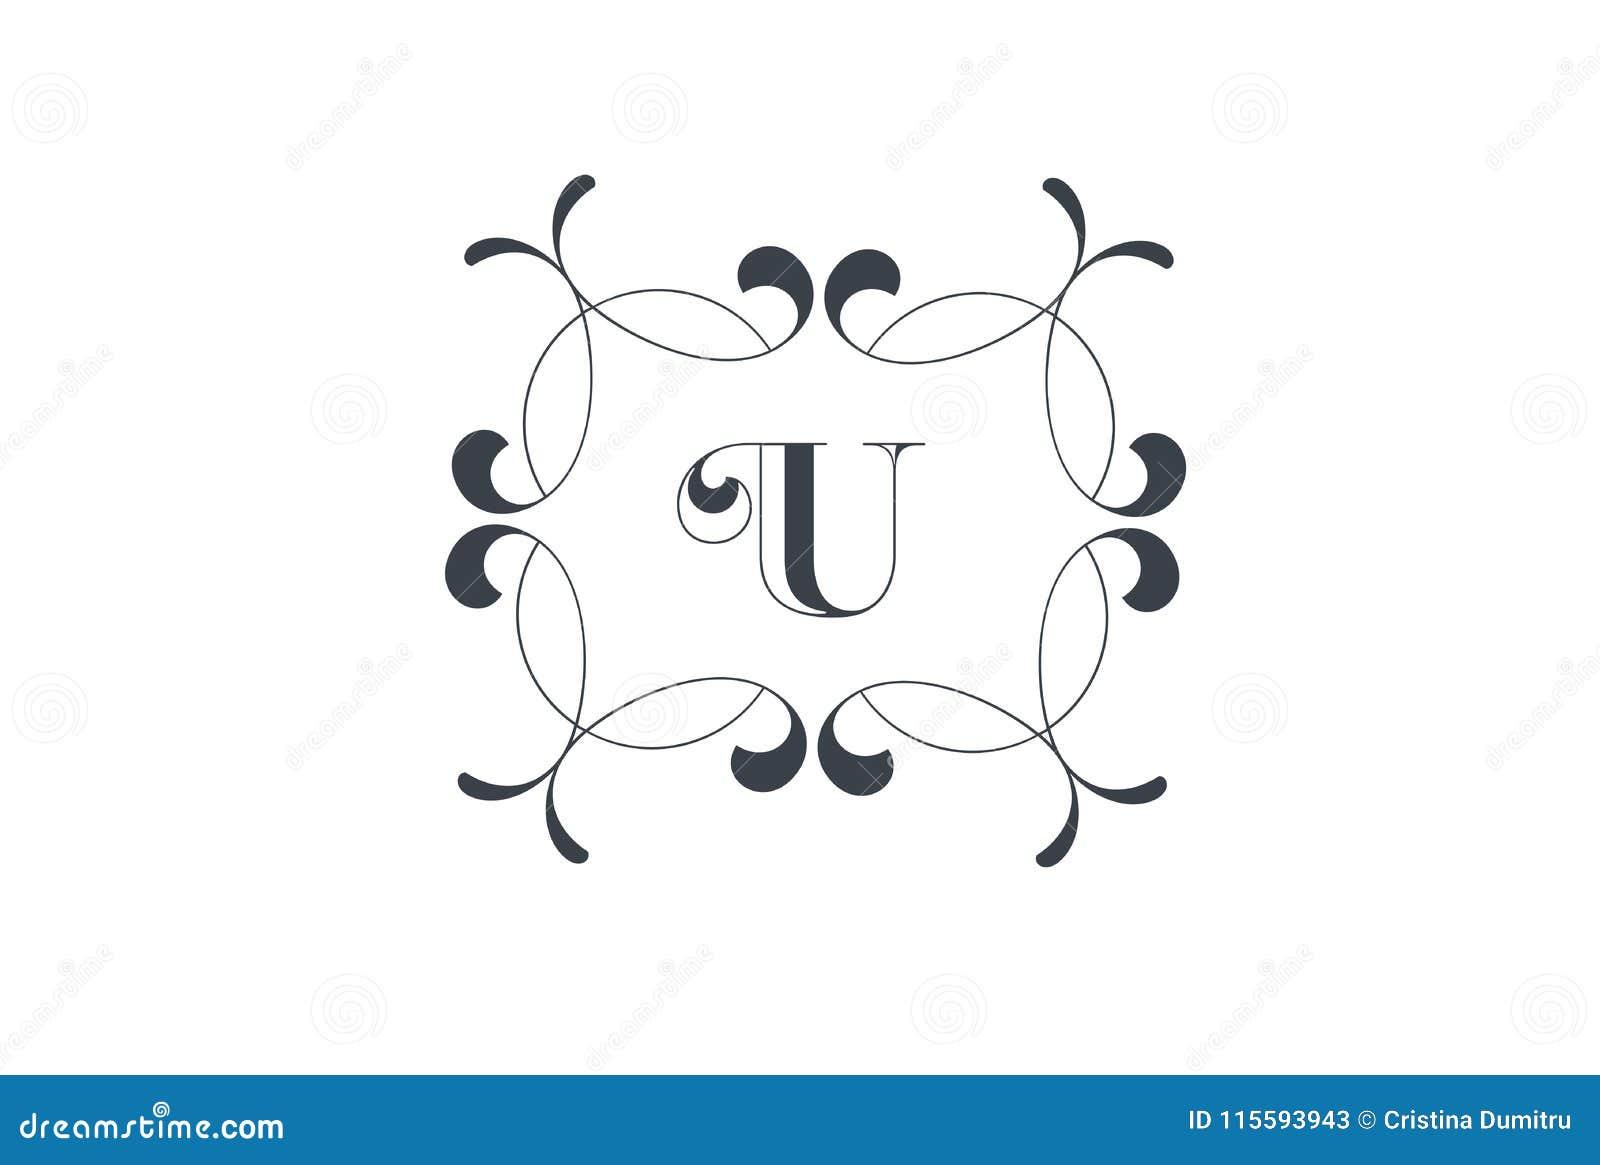 Luxury Vector Letter U Logo Design Stock Vector Illustration Of